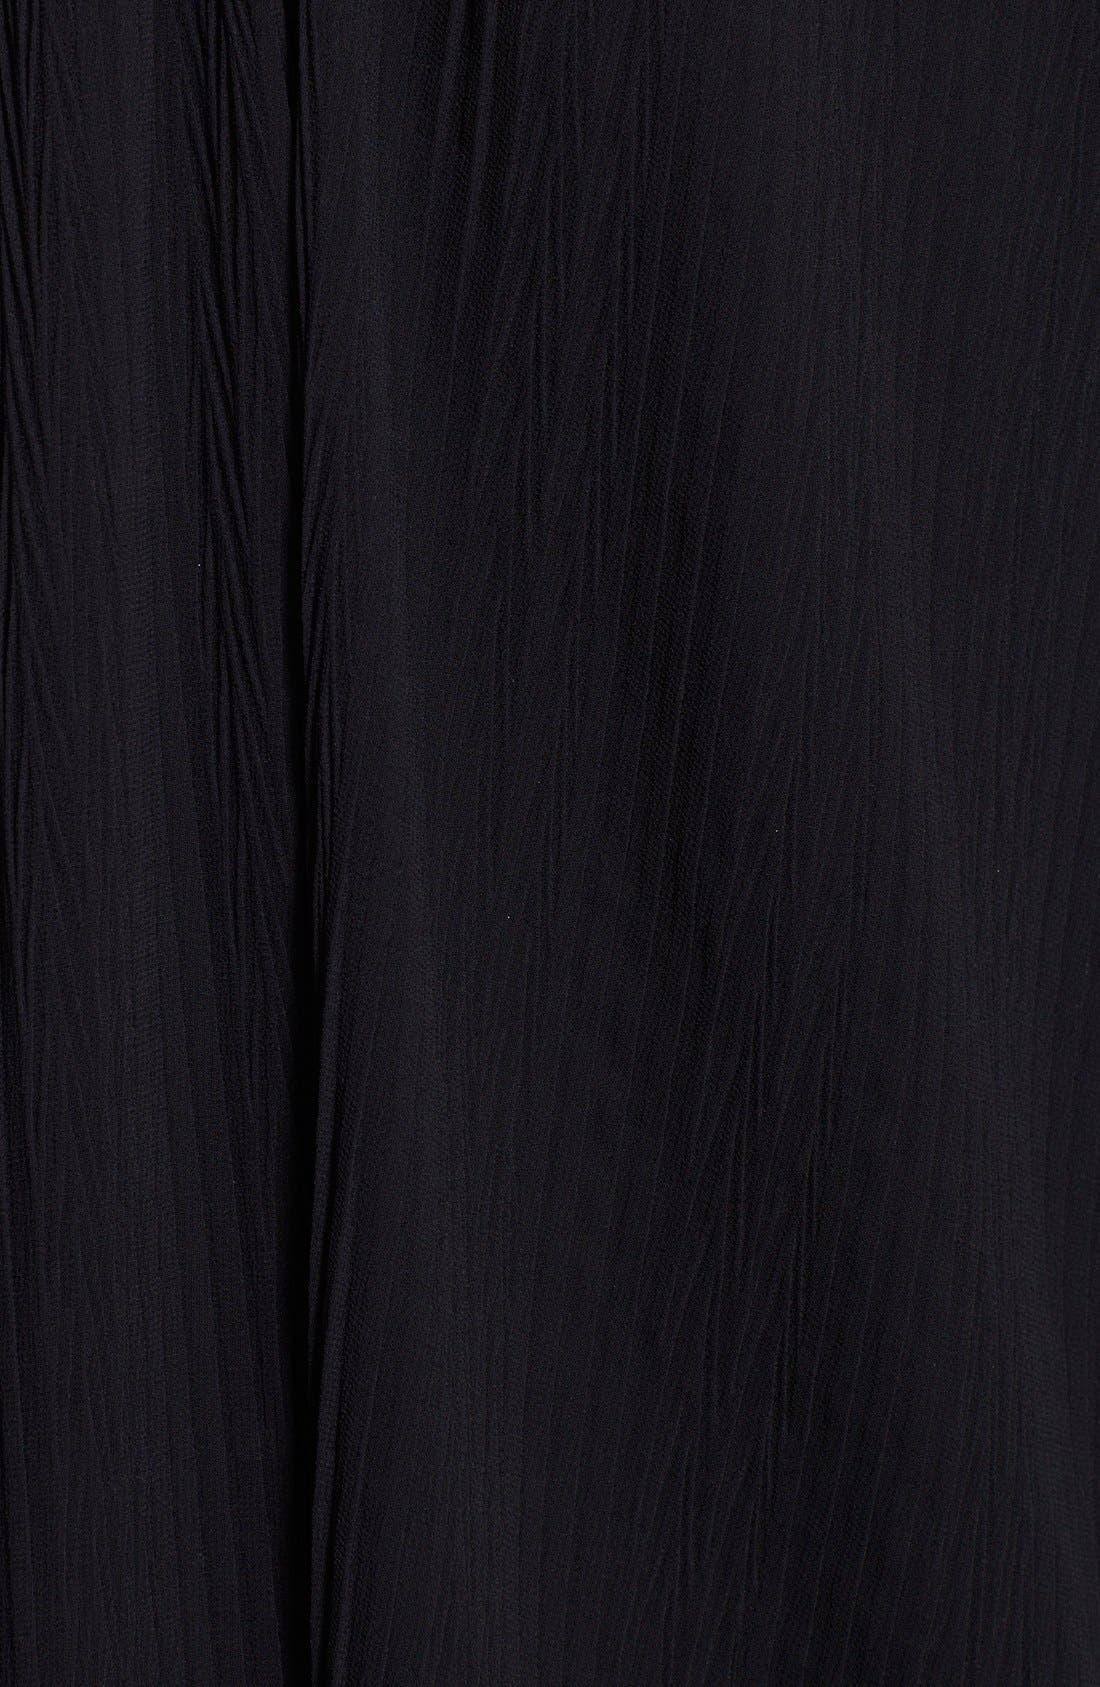 Alternate Image 3  - Alice + Olivia 'Bella' Strappy Back Maxi Dress